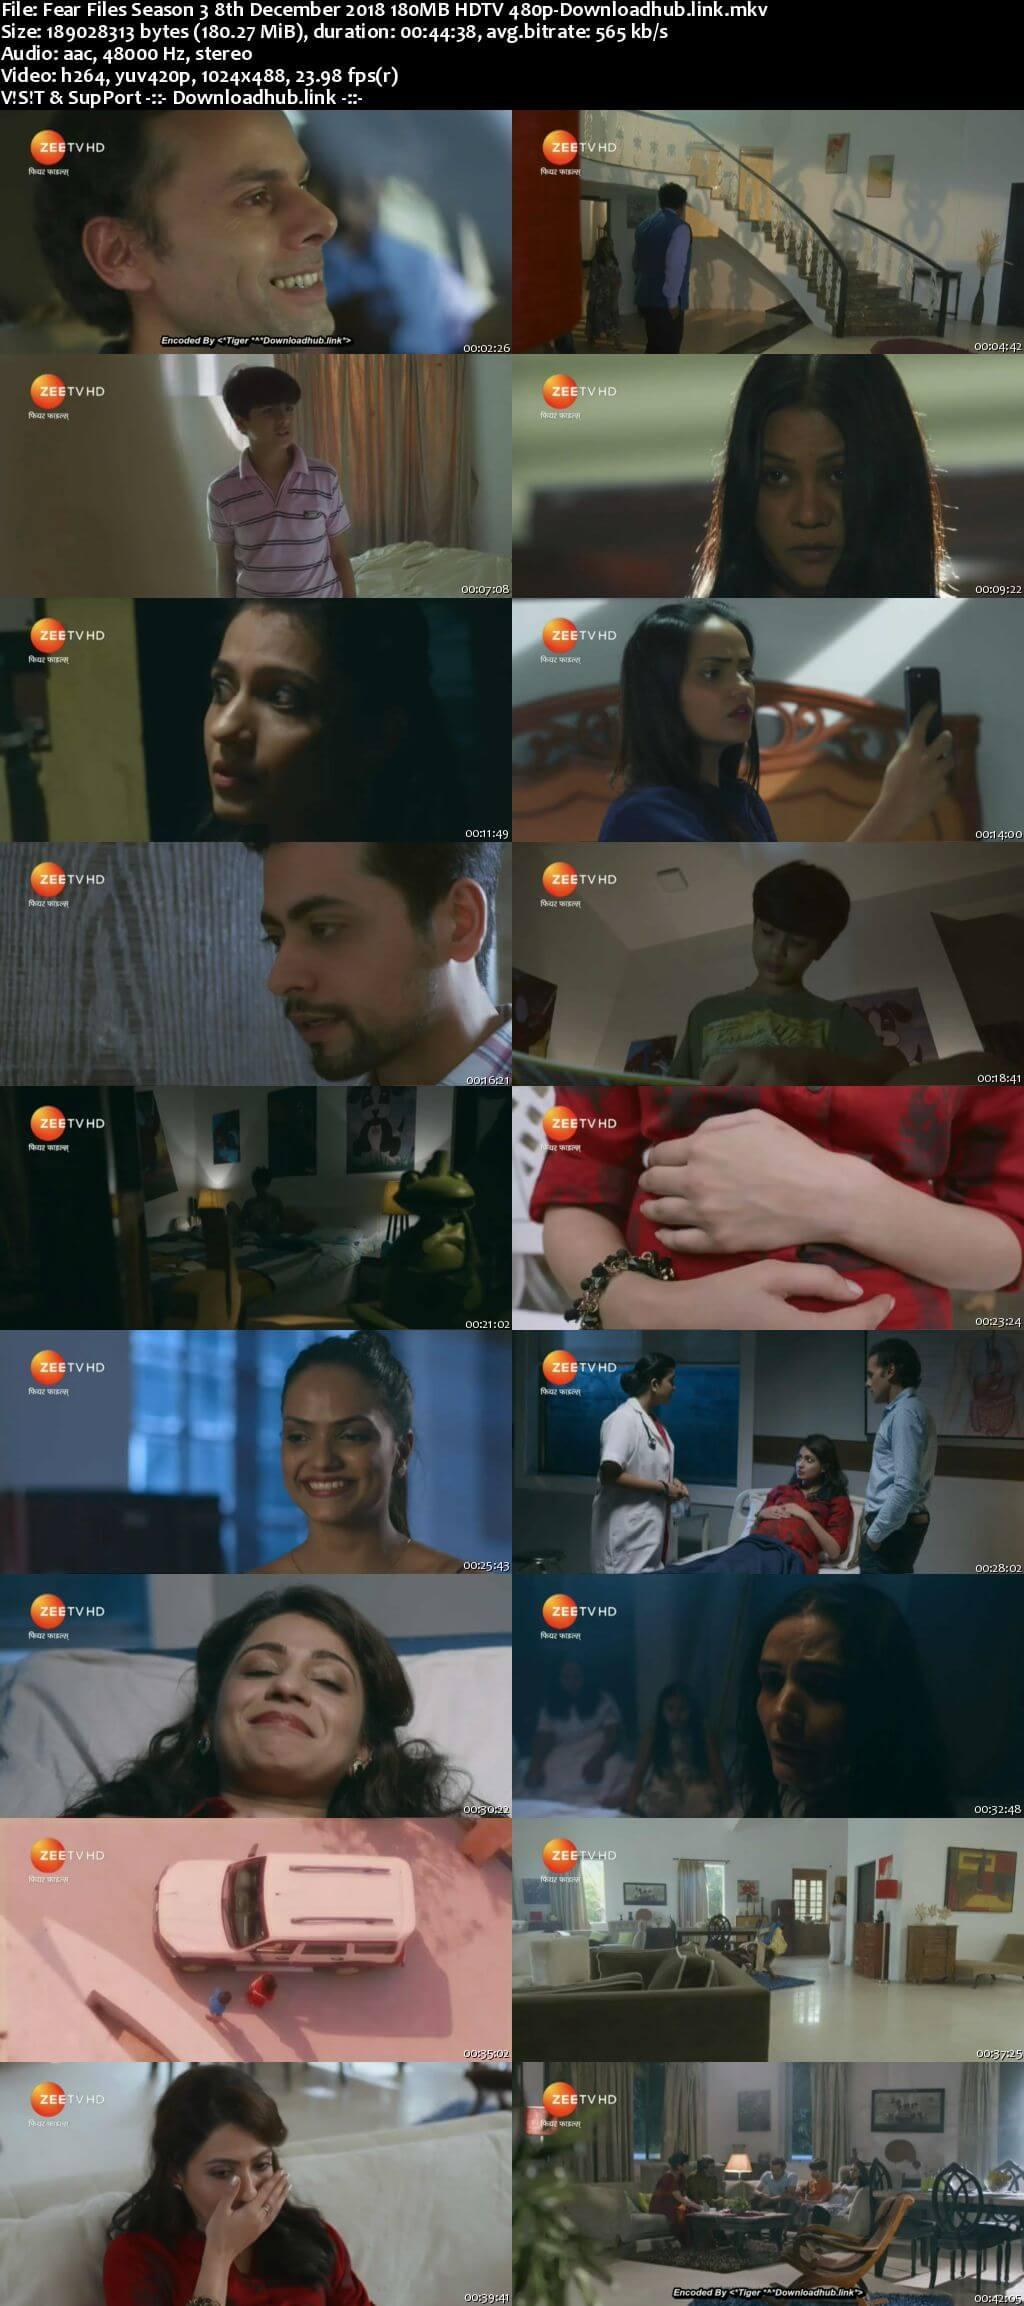 Fear Files Season 3 8th December 2018 180MB HDTV 480p